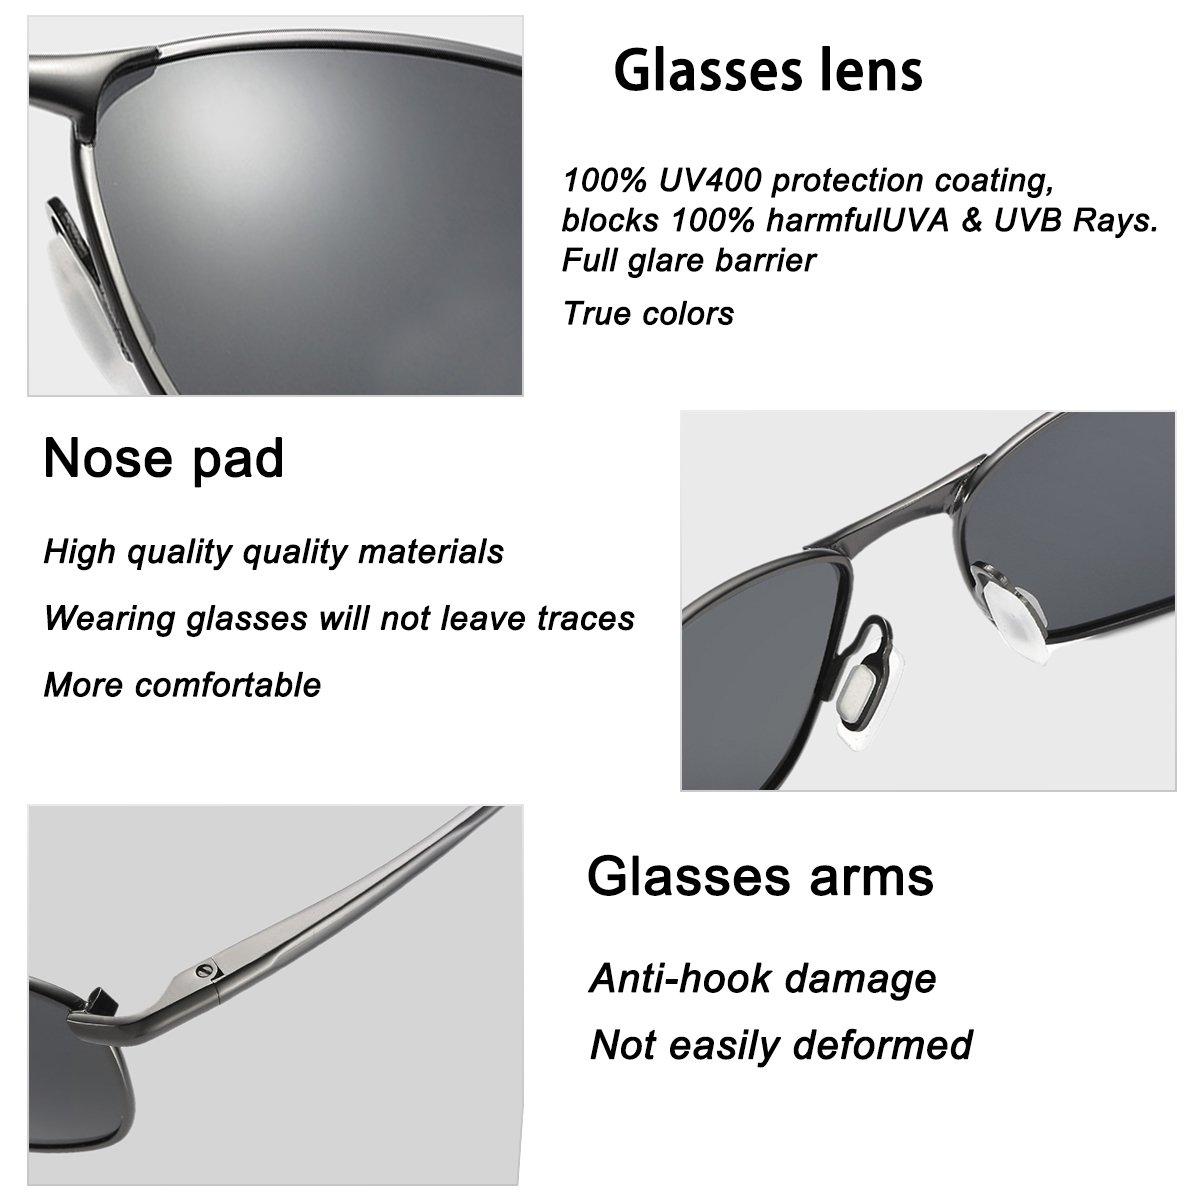 Amazon.com: FEIDU Sport Polarized Sunglasses for Men Stylish HD Lens Metal Frame Mens Sunglasses FD 9005 (Black/Gun, 2.24): Home & Kitchen